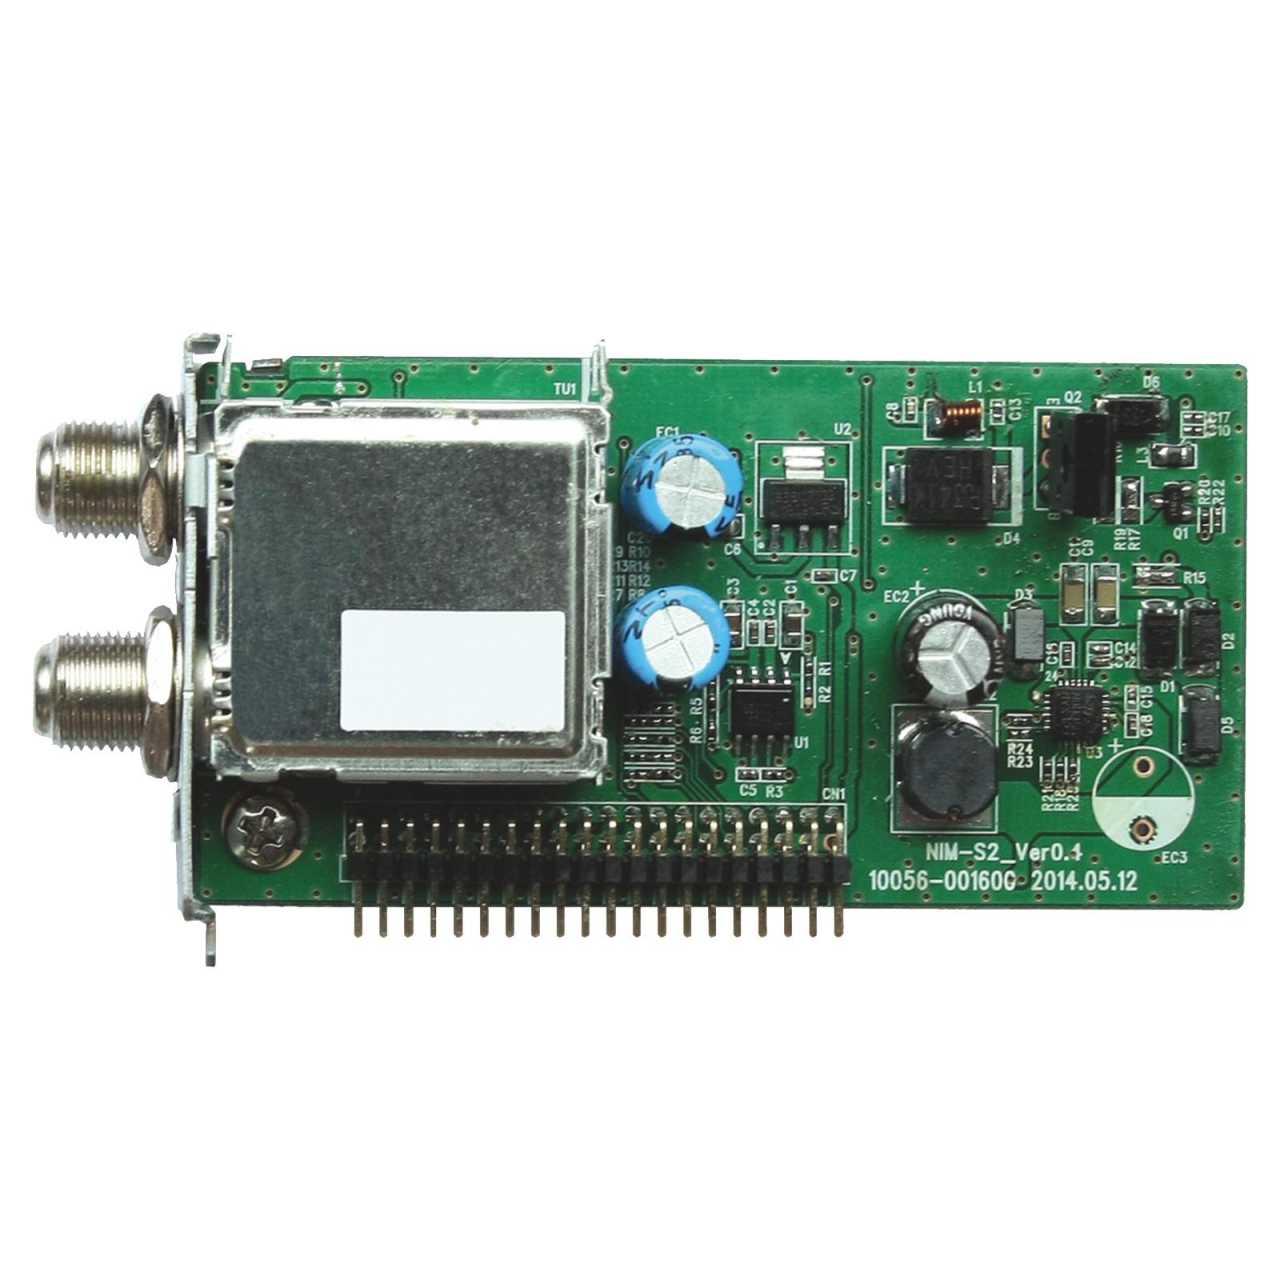 Formuler F1 Plug & Play DVB-S2 HDTV Sat Tuner FORZUB001